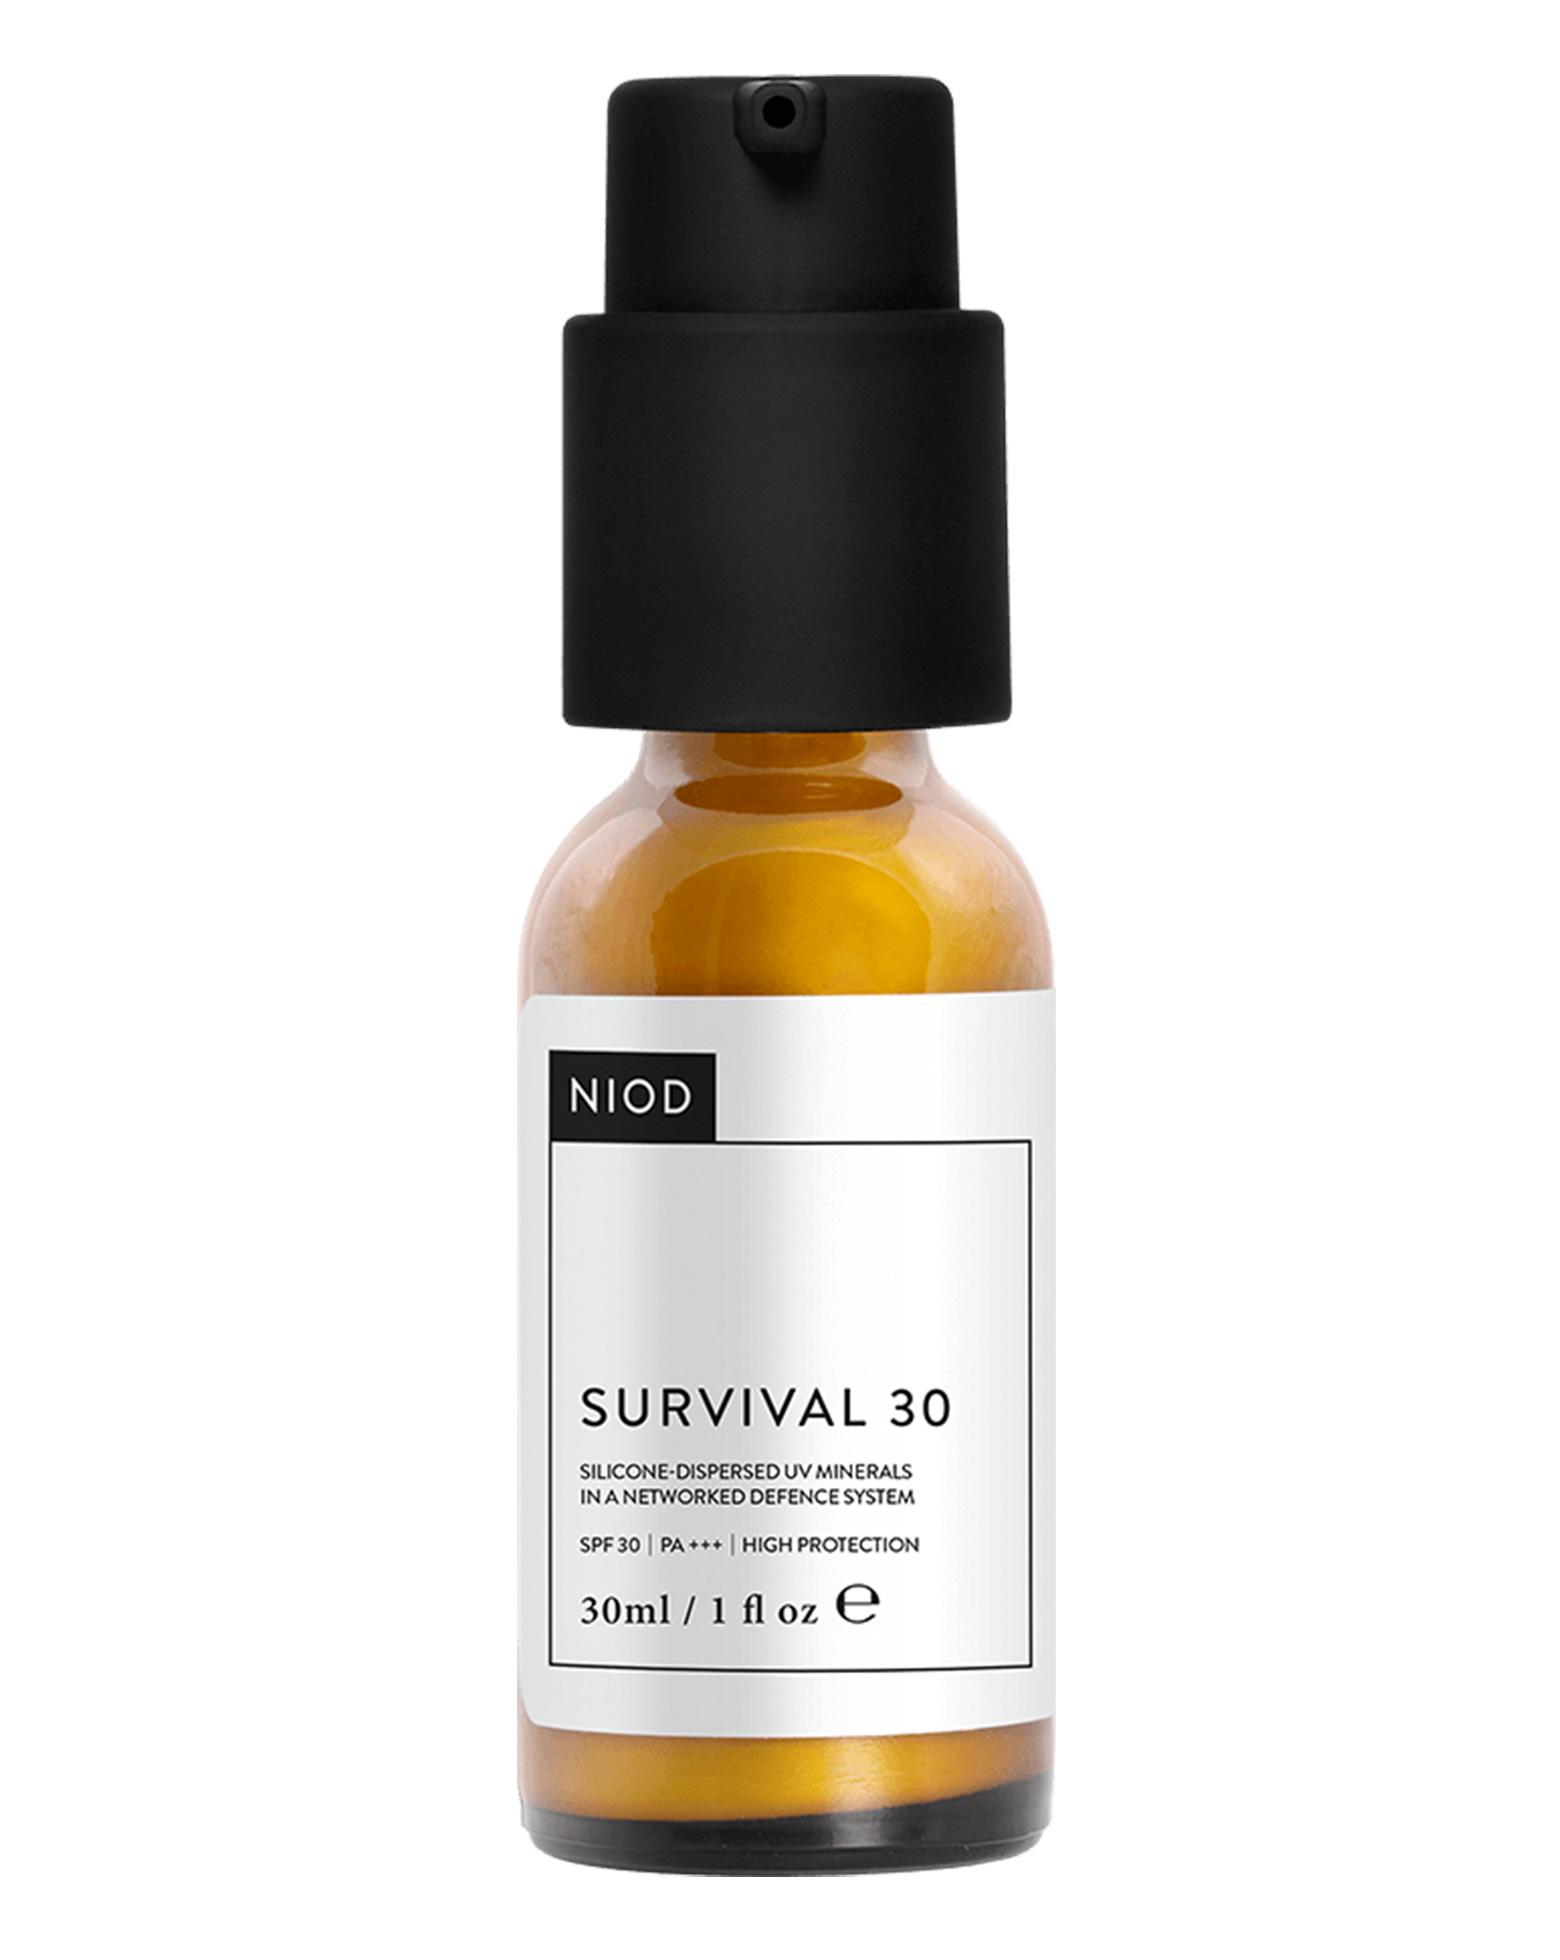 Survival 30